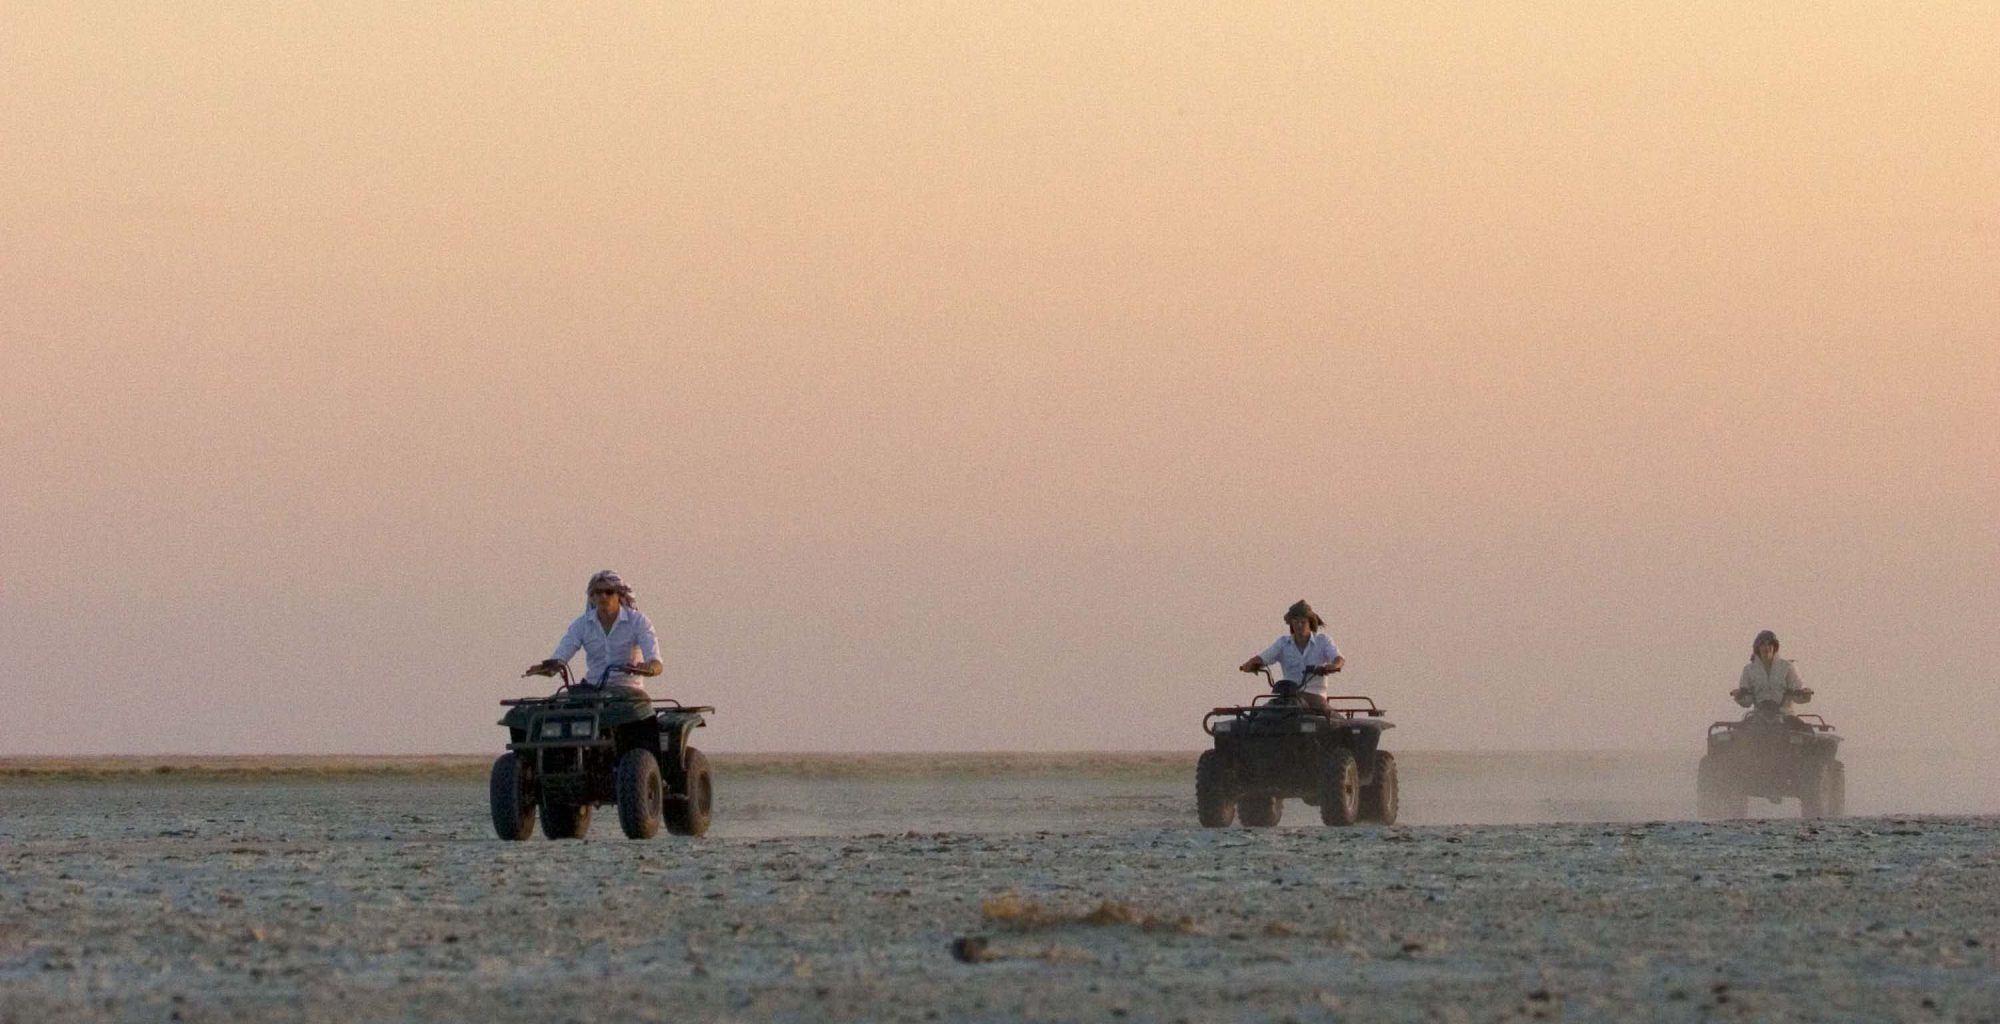 Botswana-Kalahari-Makgadikgadi-Pans-Sunset-Quad-Bike